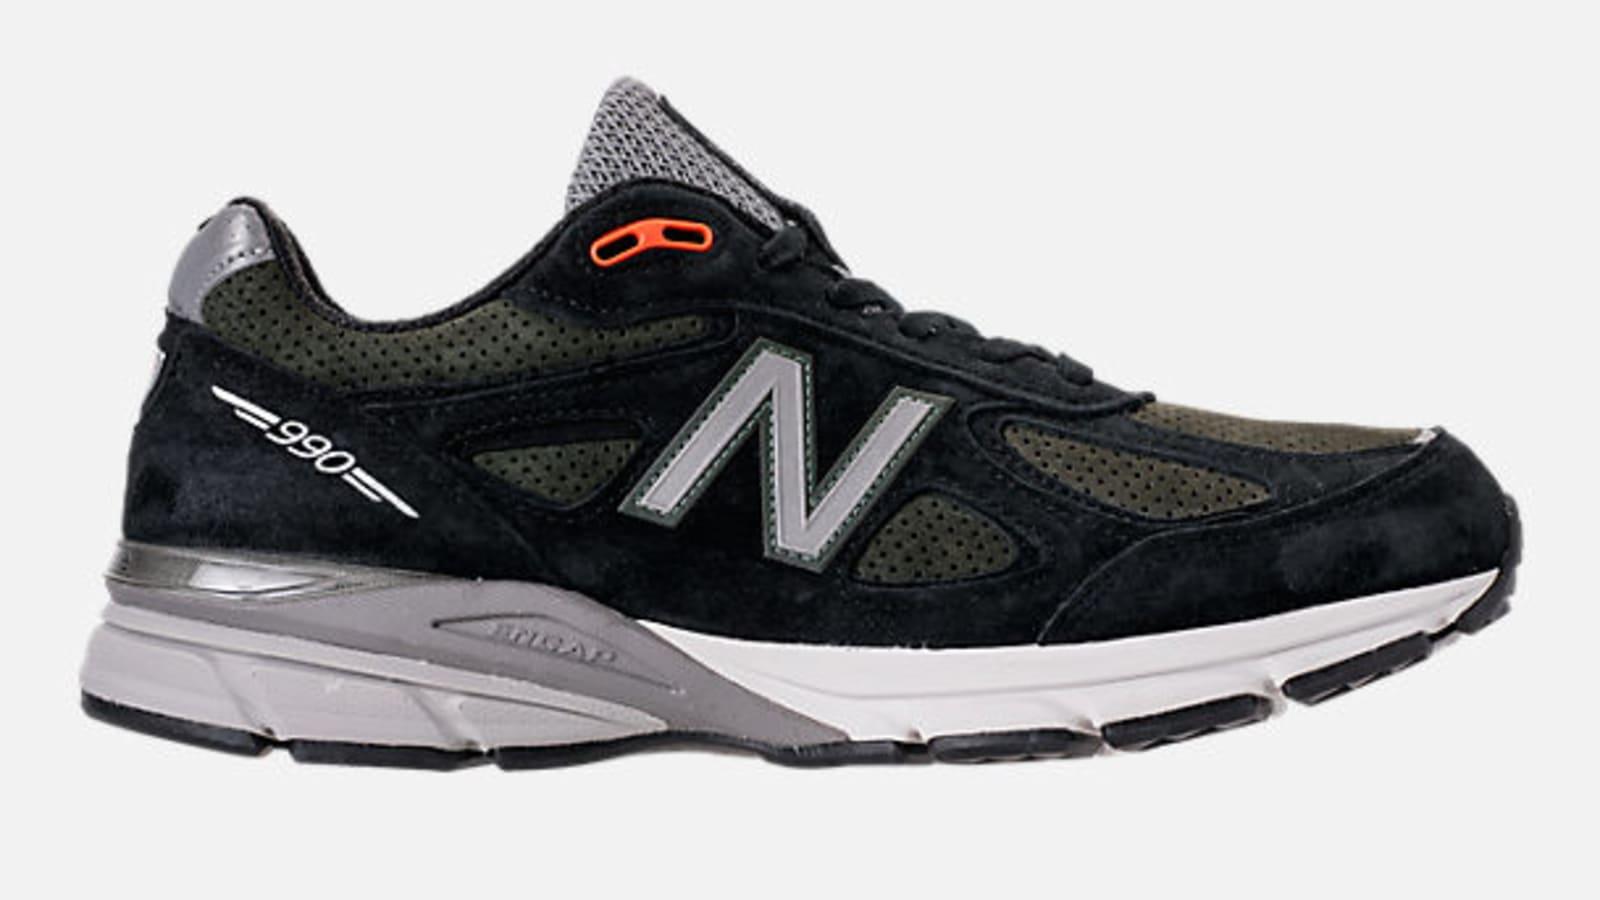 purchase cheap f4365 624ca New Balance 990v4 'Black/Rosin' - Sneaker Sales December 14 ...